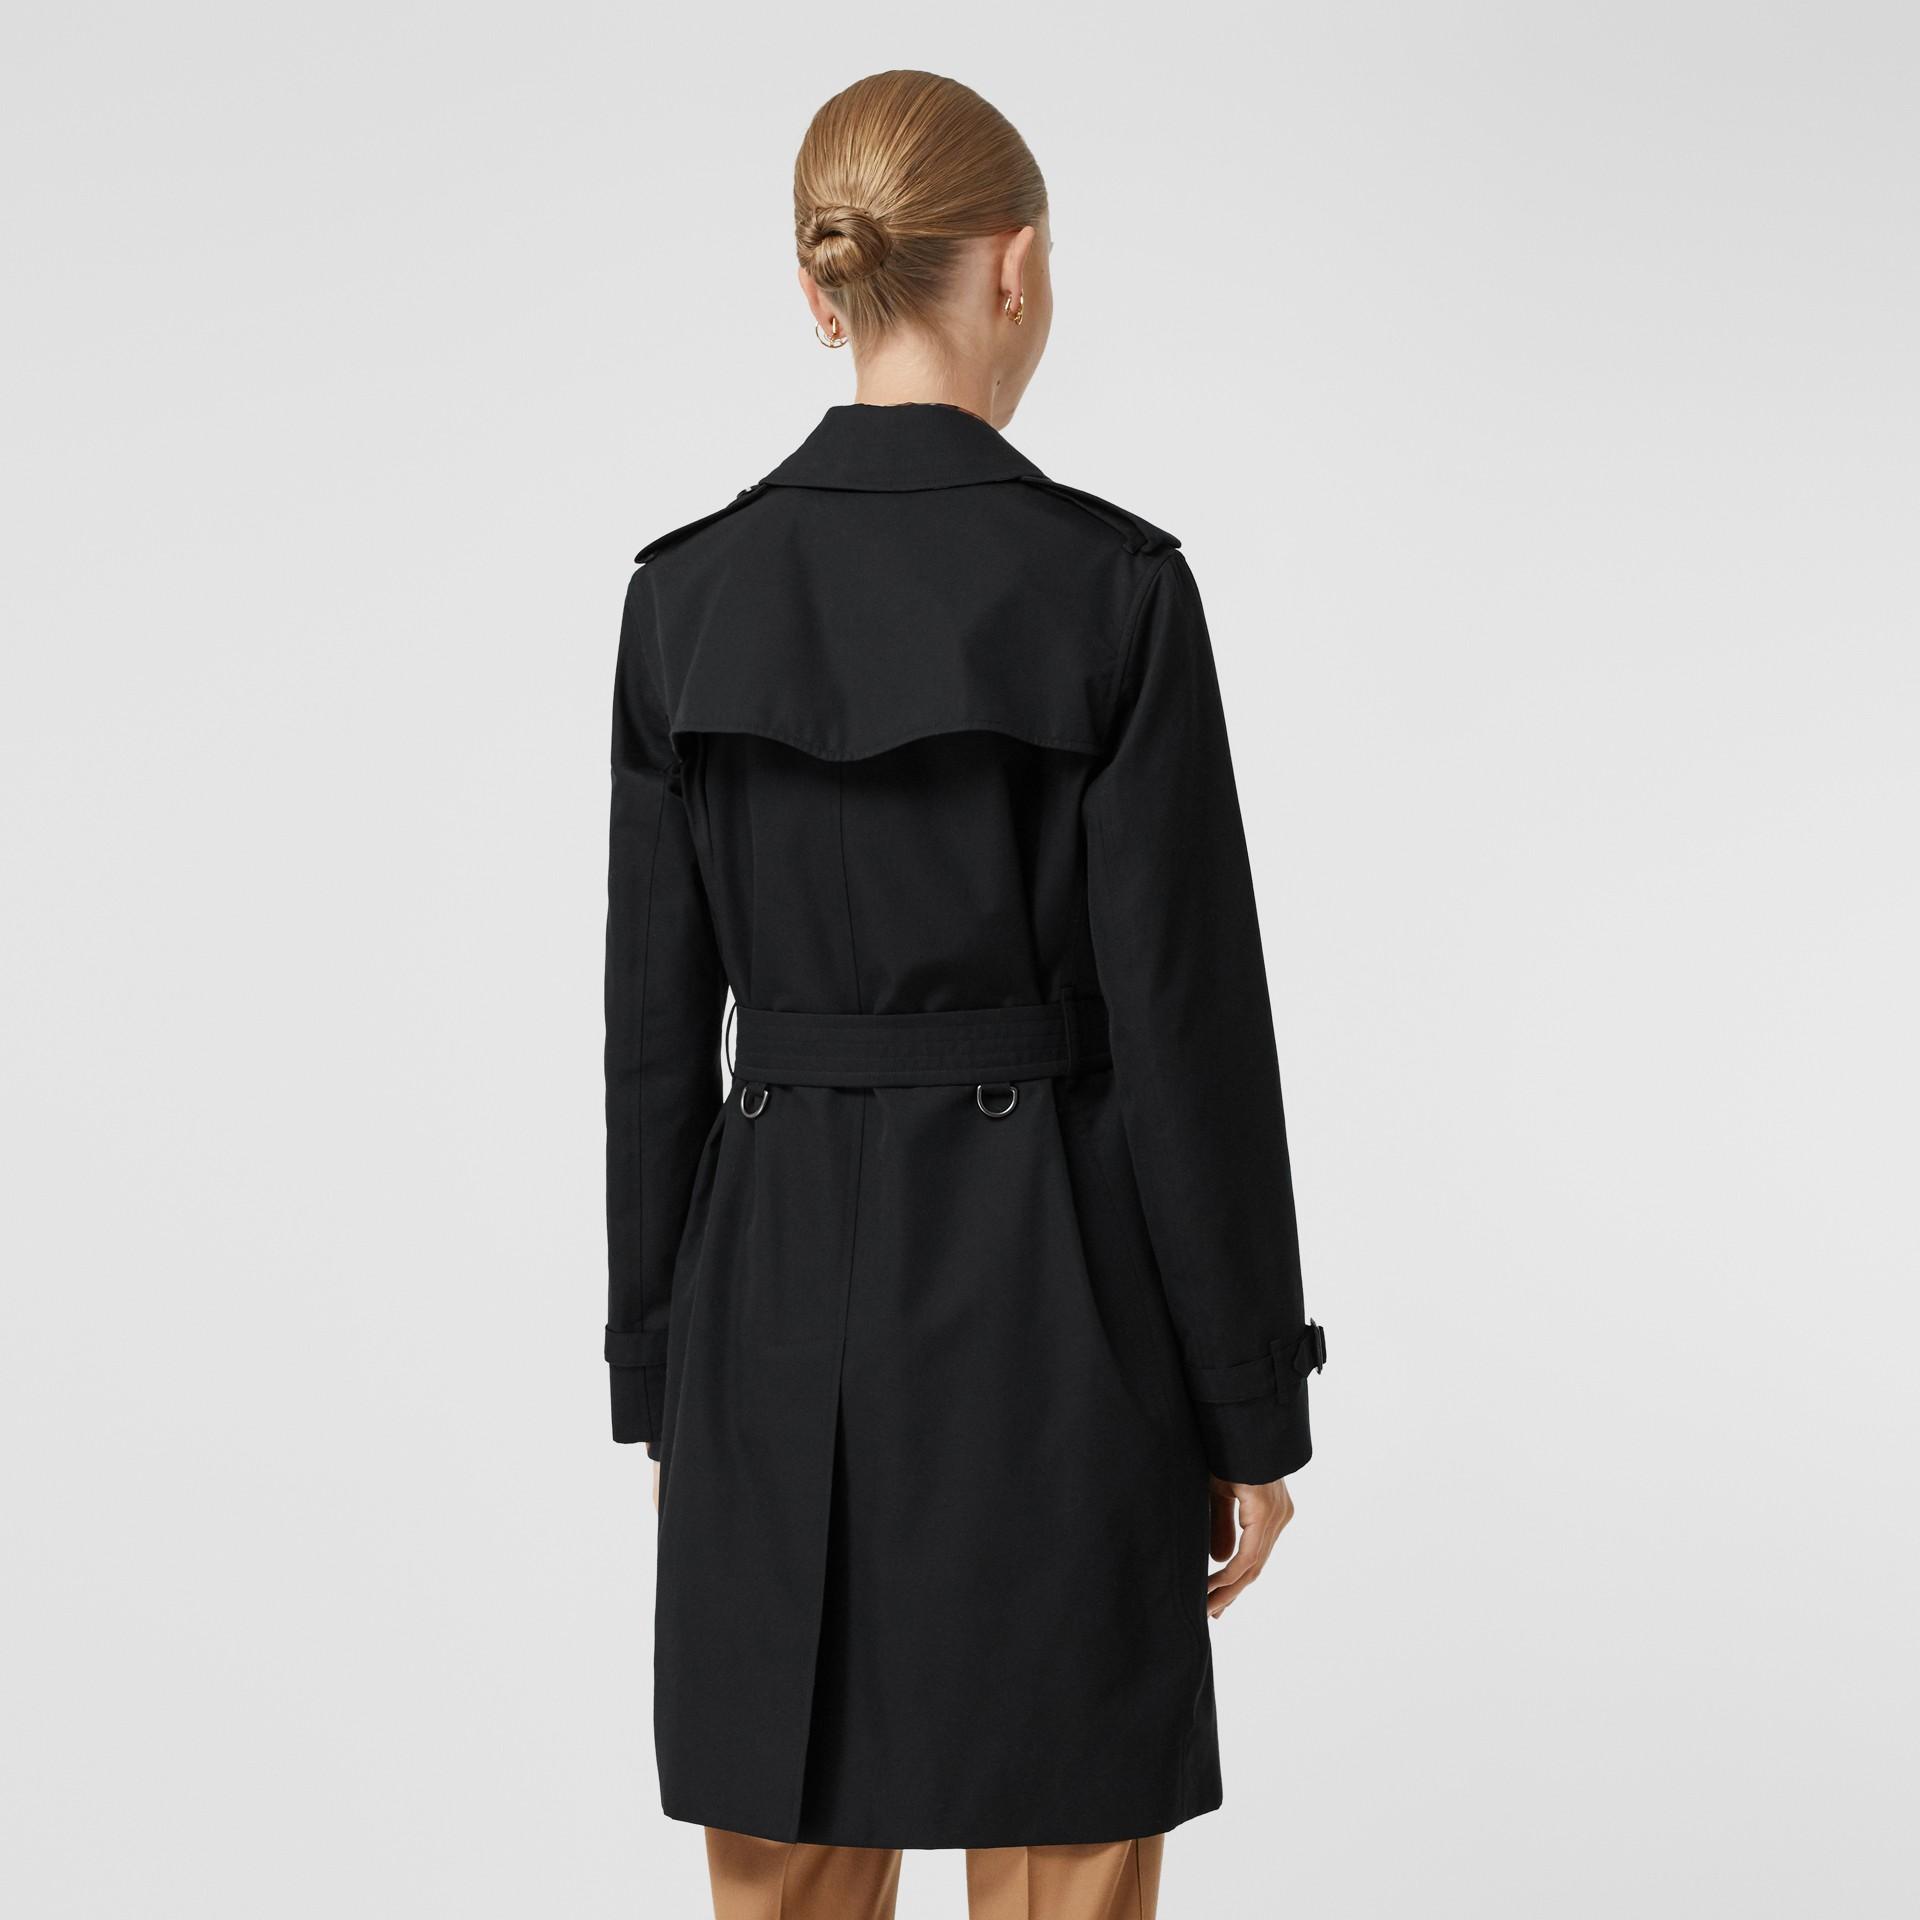 Kensington Fit Cotton Gabardine Trench Coat in Black - Women | Burberry United Kingdom - gallery image 6